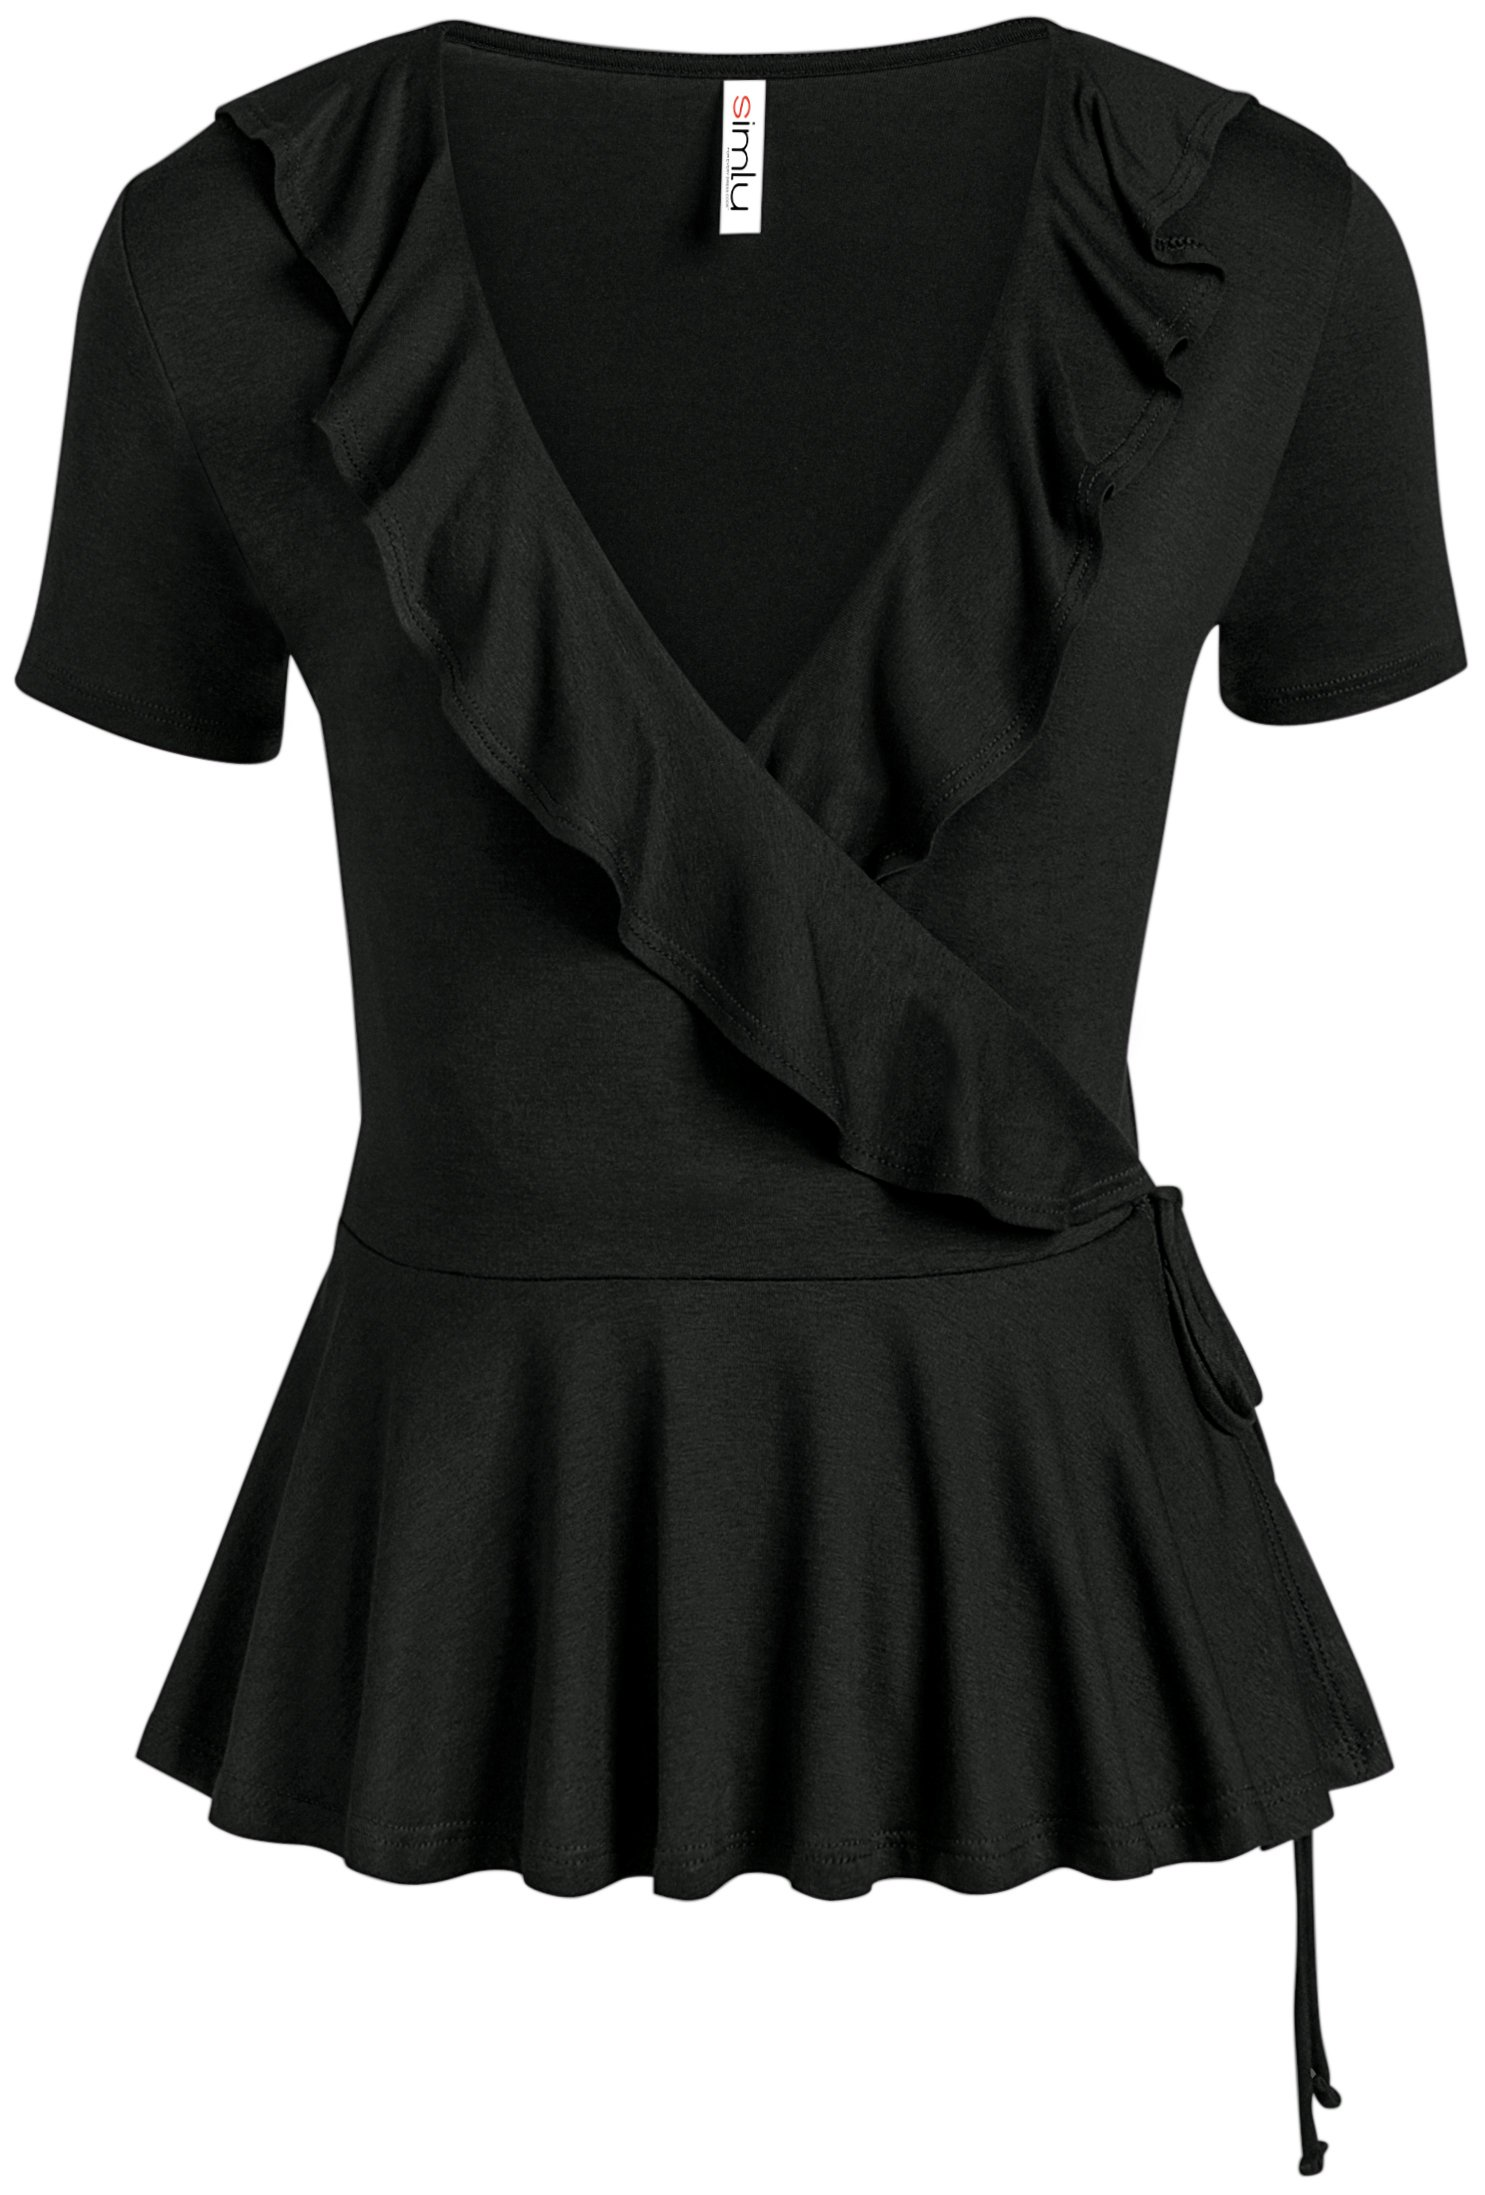 Simlu Womens Black Wrap Top Short Sleeve Deep V Neck Self Tie Black Peplum Shirt, Medium